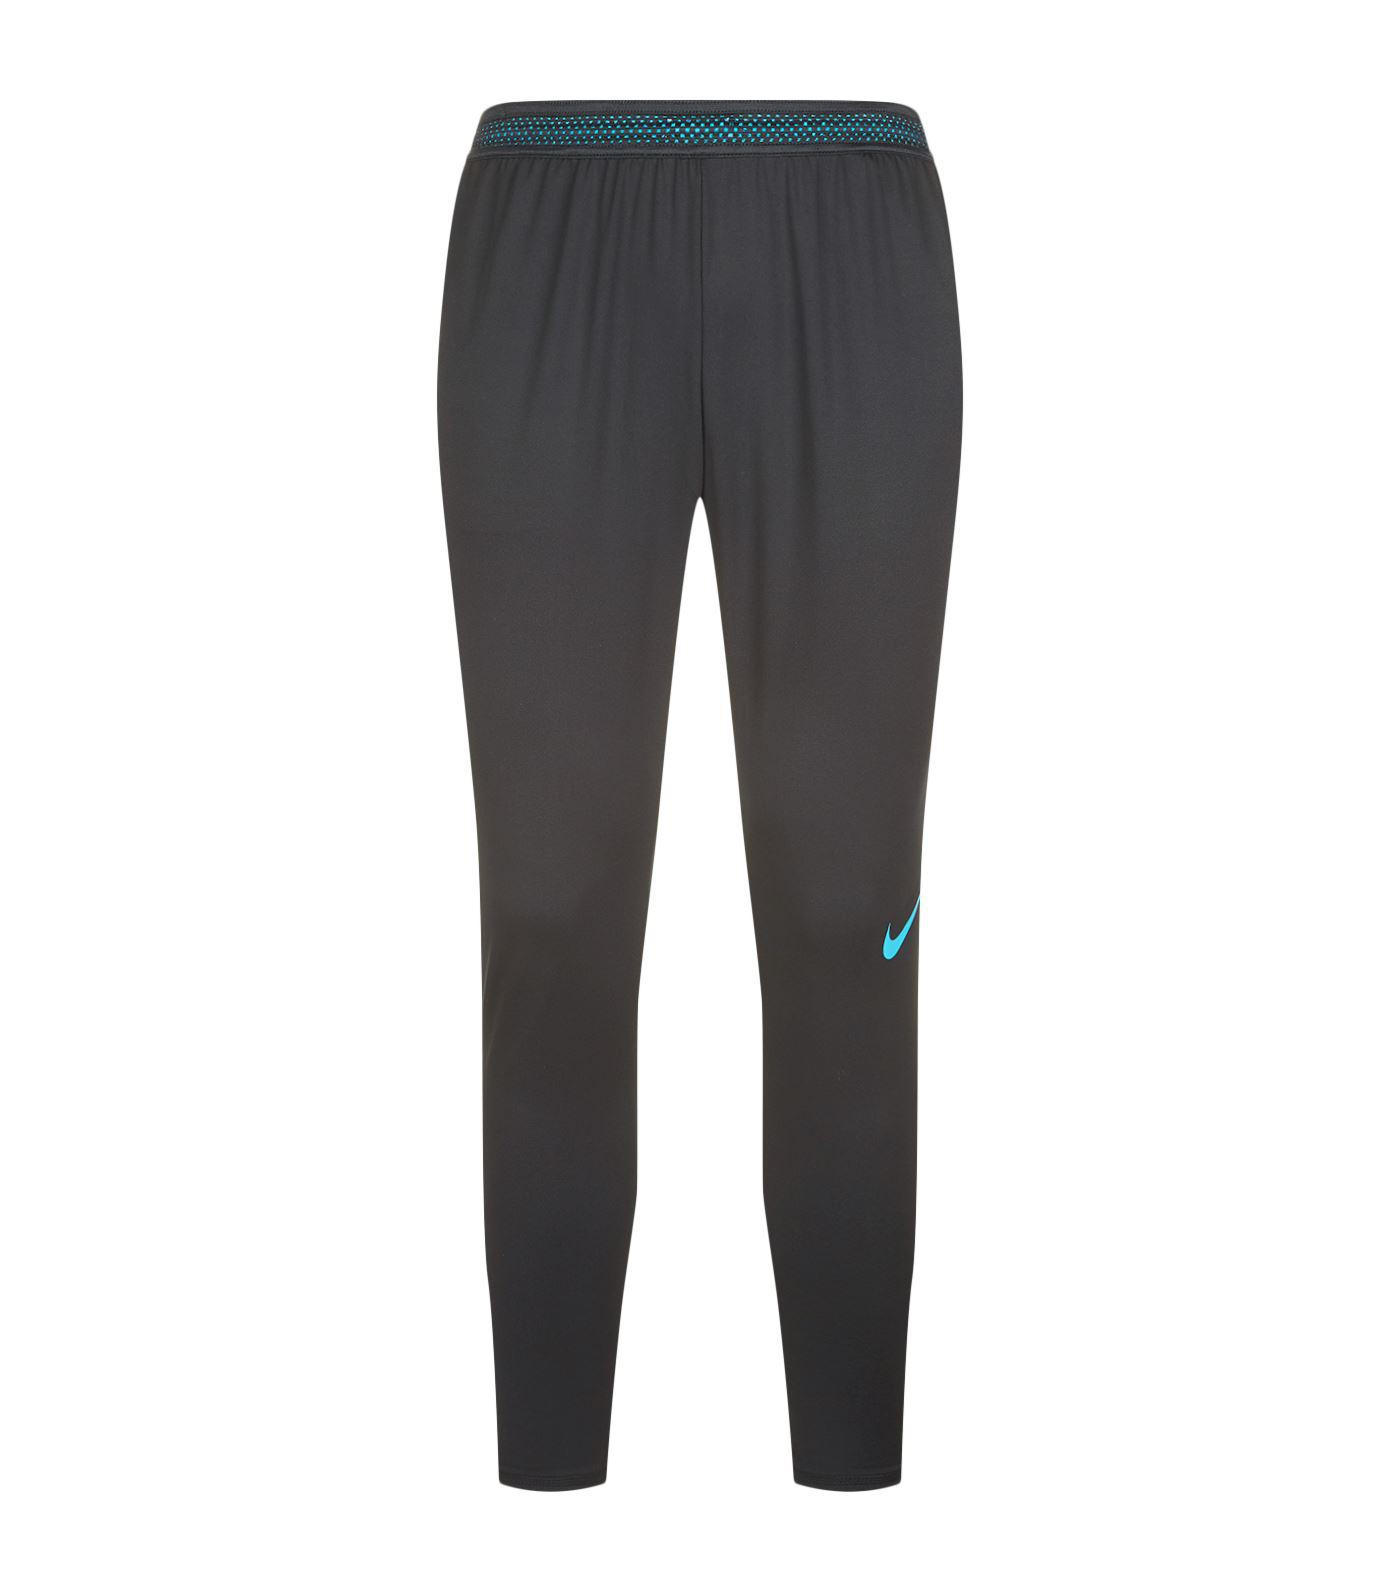 c4e2618847889 Lyst - Nike Dry Strike Training Tights in Black for Men